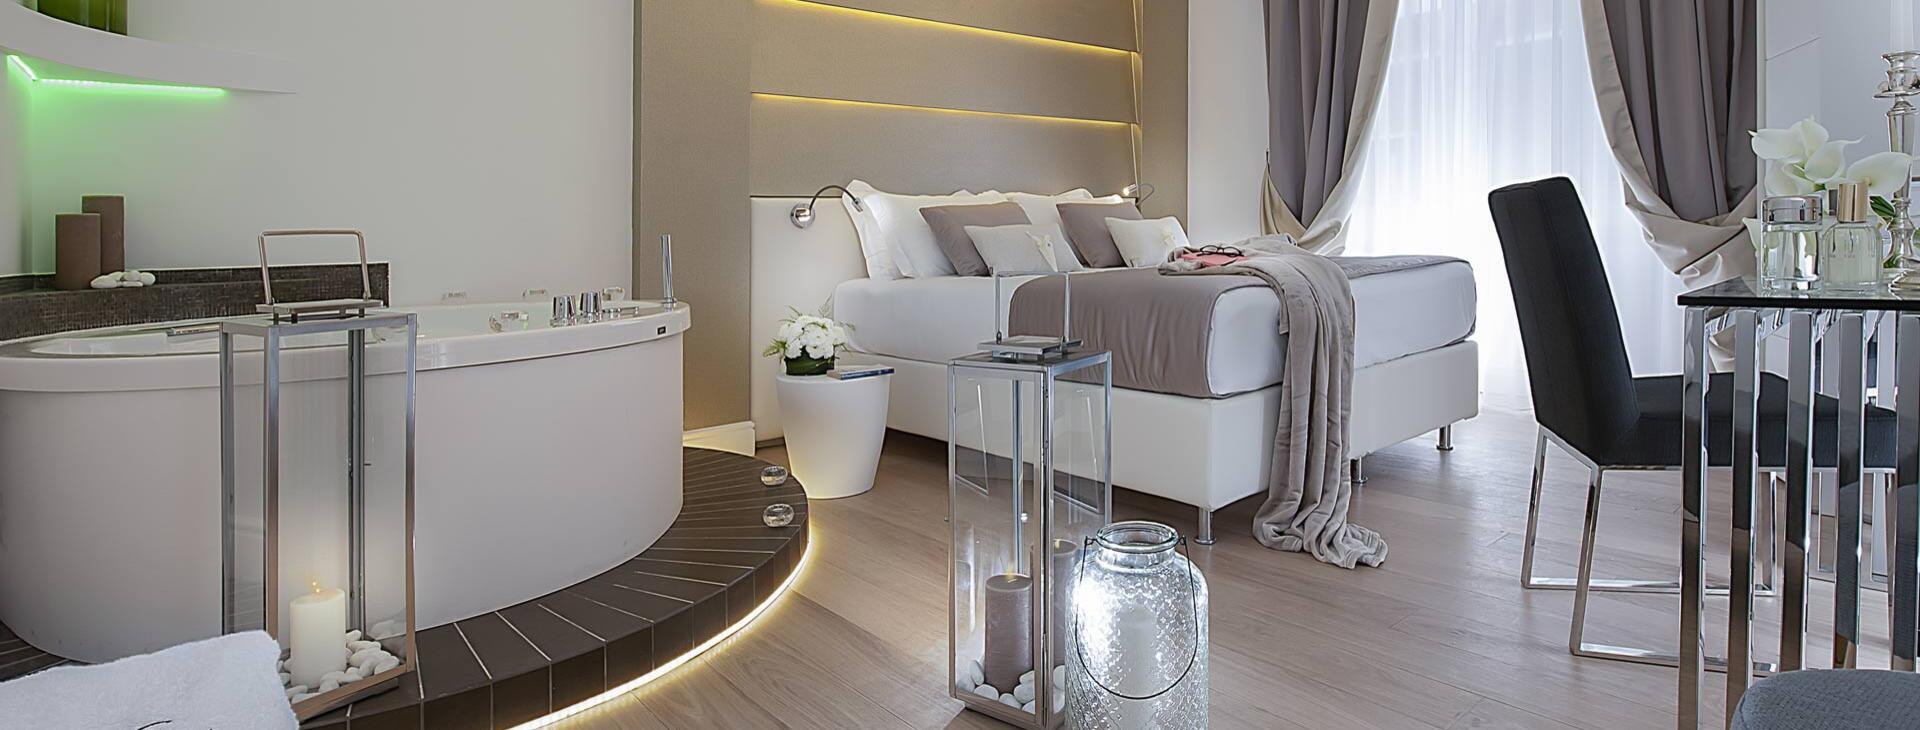 vaticanstyle it vatican-style-hotel-offerte-speciali 001